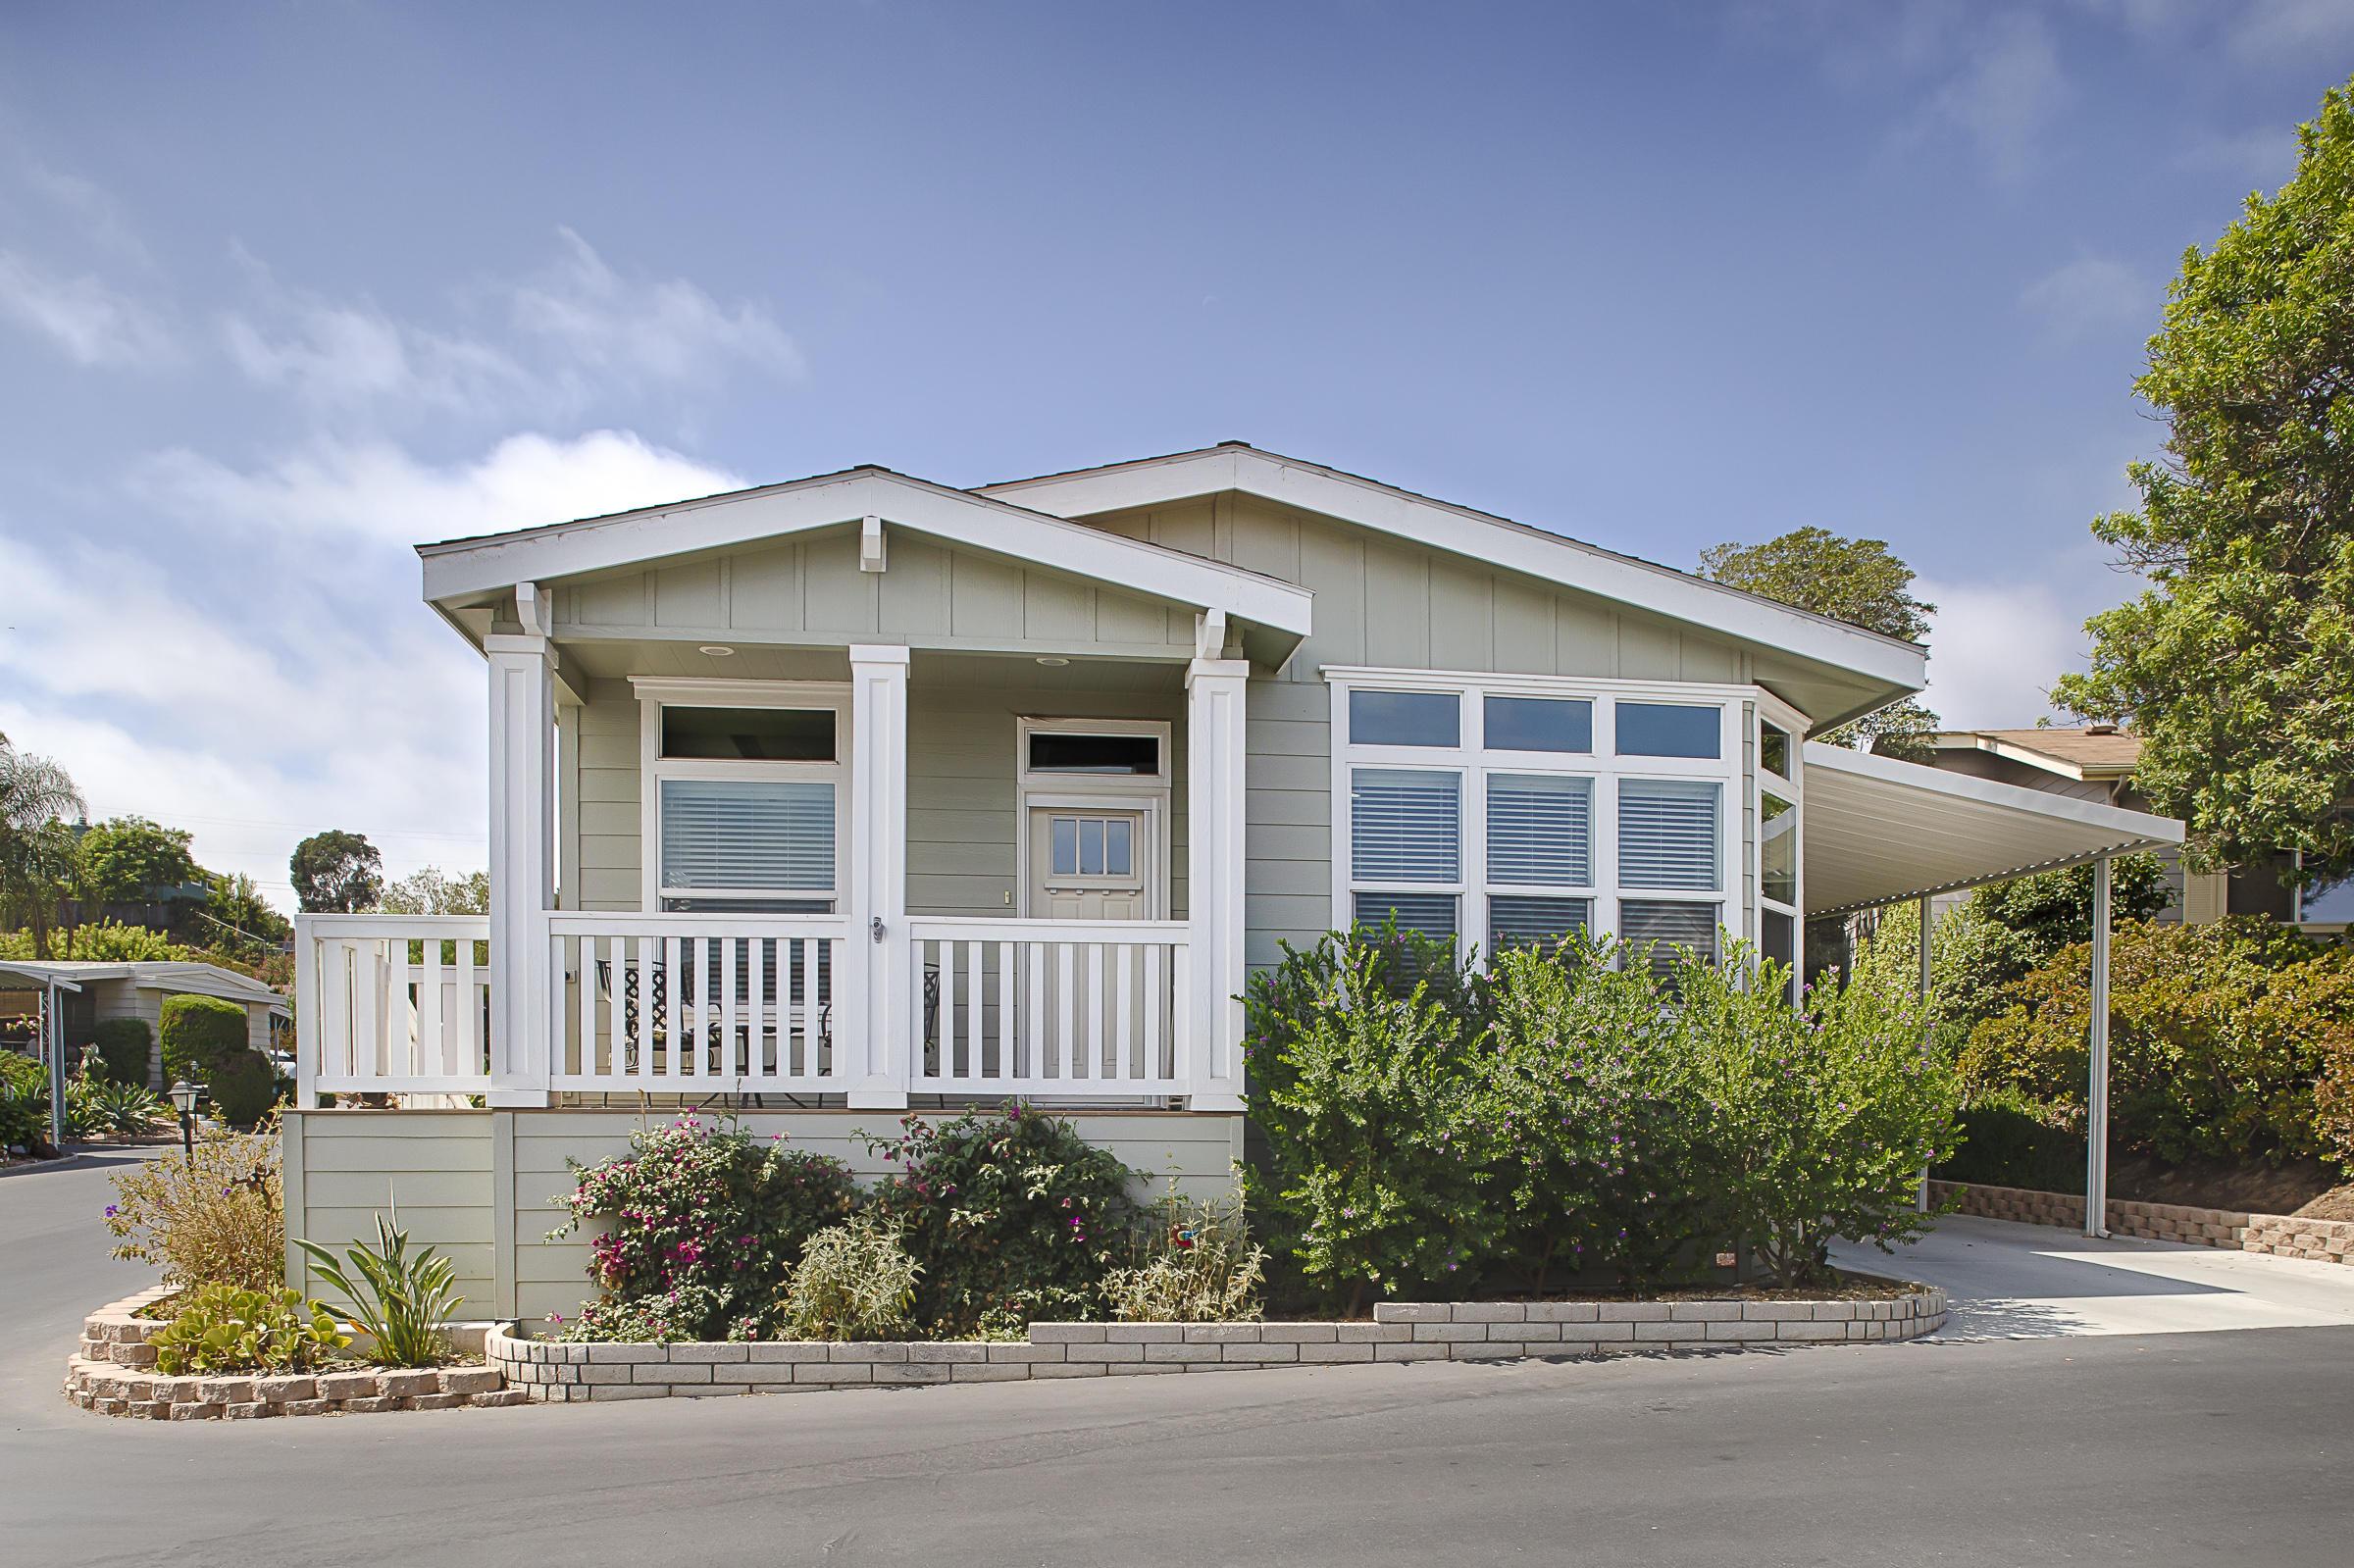 Property photo for 333 Old Mill Rd #278 Santa Barbara, California 93110 - 18-3286